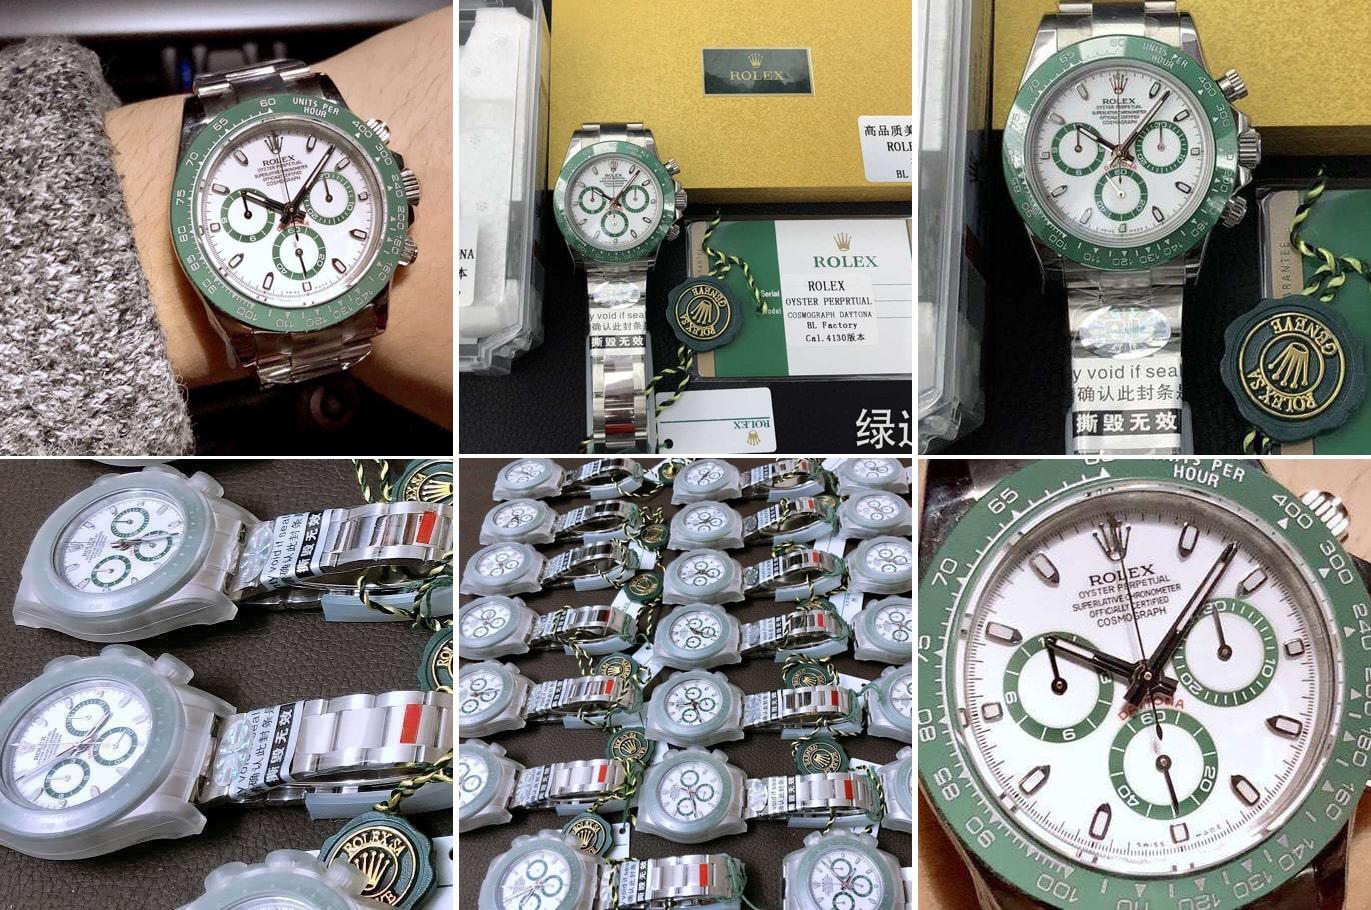 Hinh-anh-thuc-te-Dong-ho-Rolex-Daytona-Cosmograph-665600